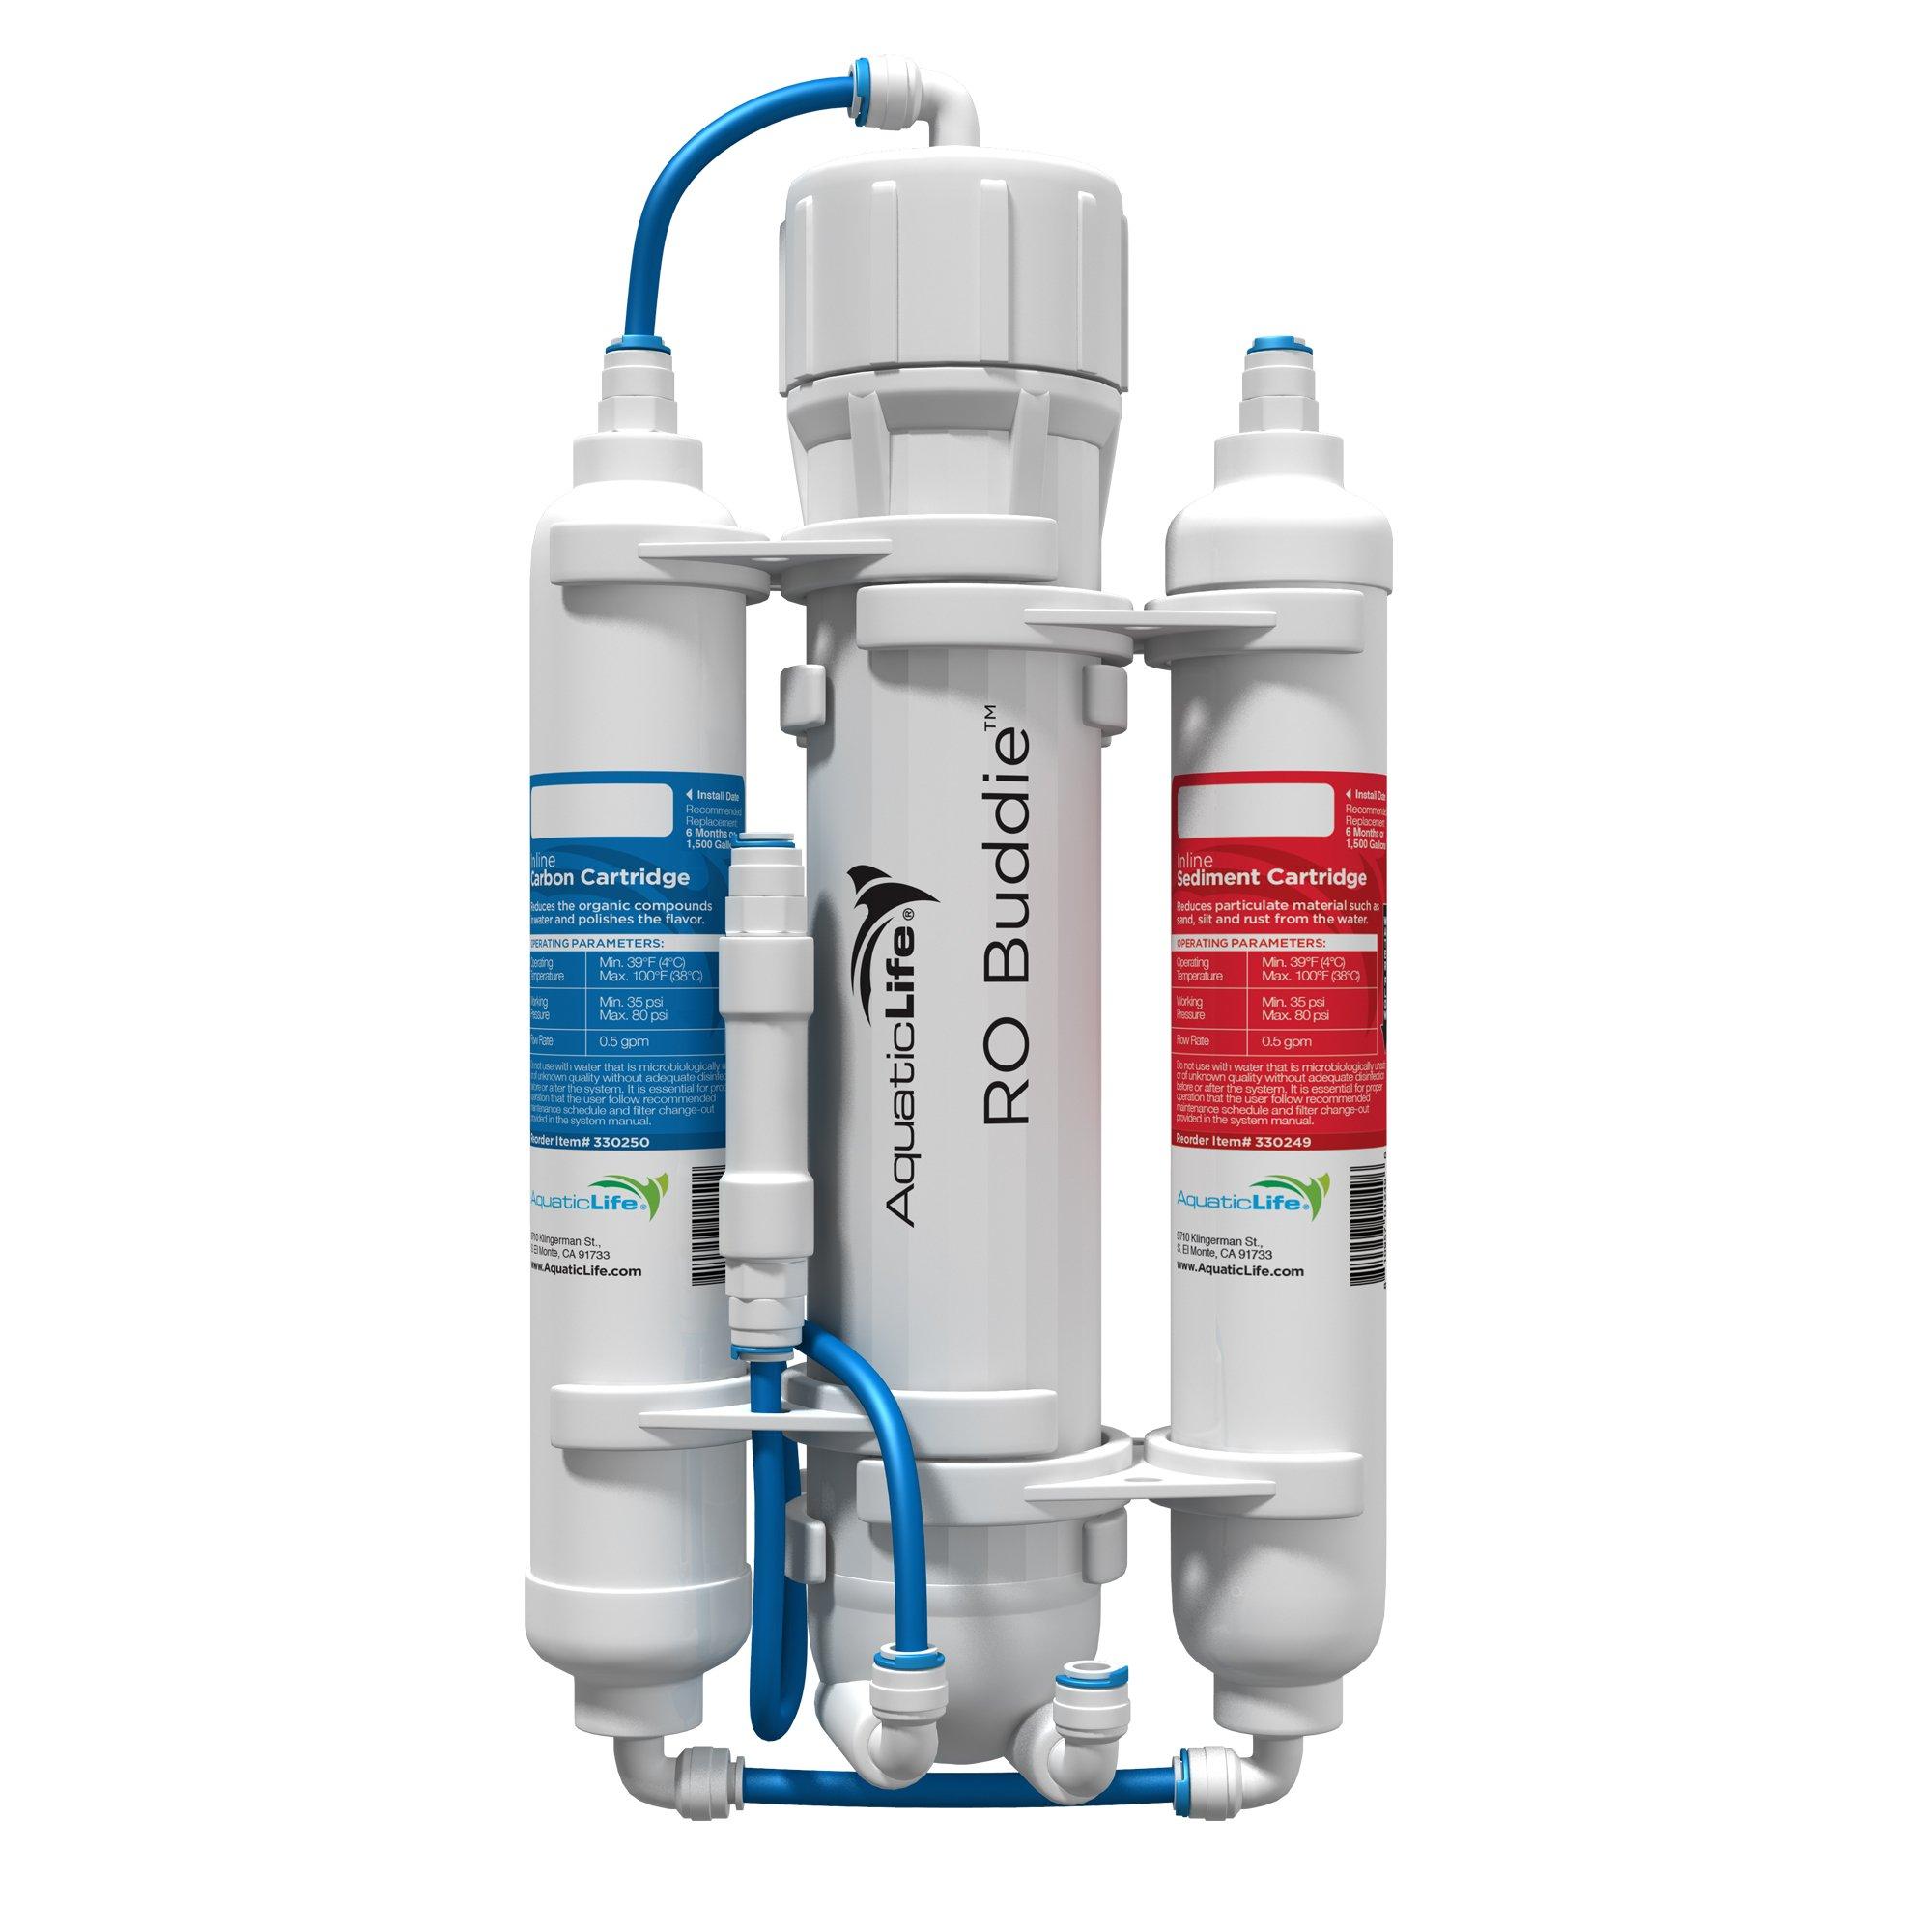 Aquatic Life RO Buddie Three Stage Reverse Osmosis, 50-Gallon by Aquatic Life